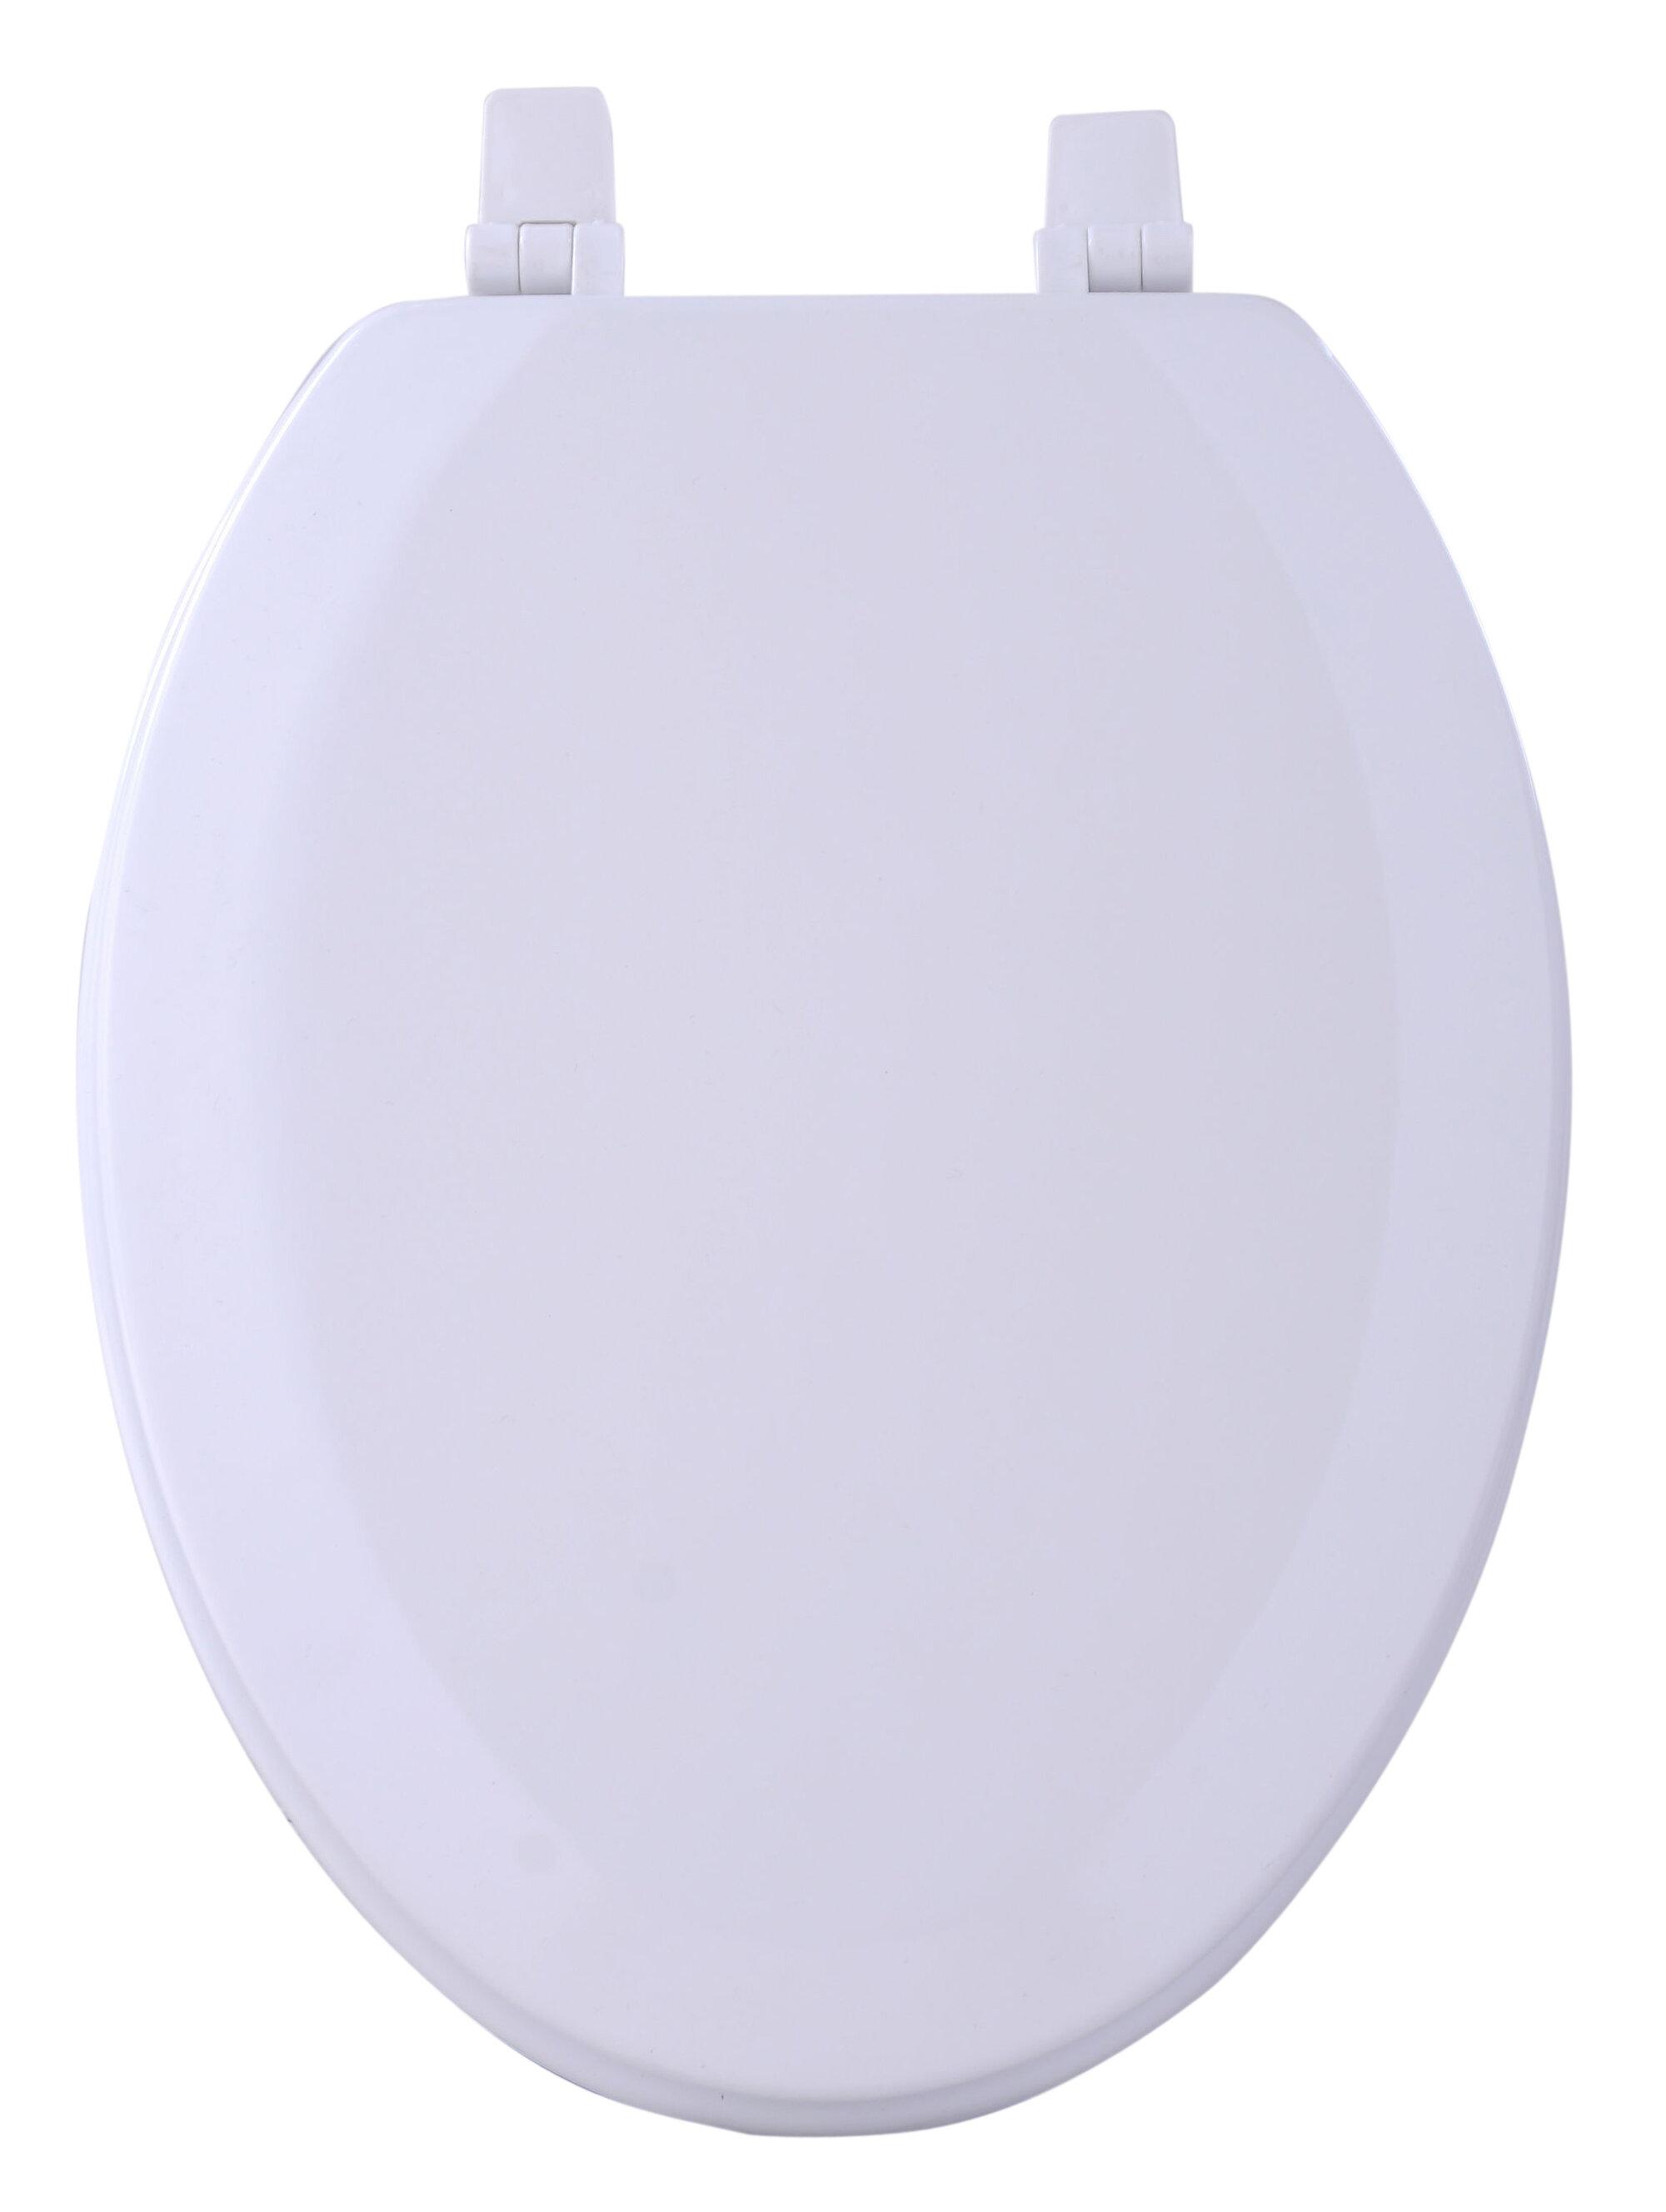 Achim Importing Co Fantasia Elongated Toilet Seat Reviews Wayfair